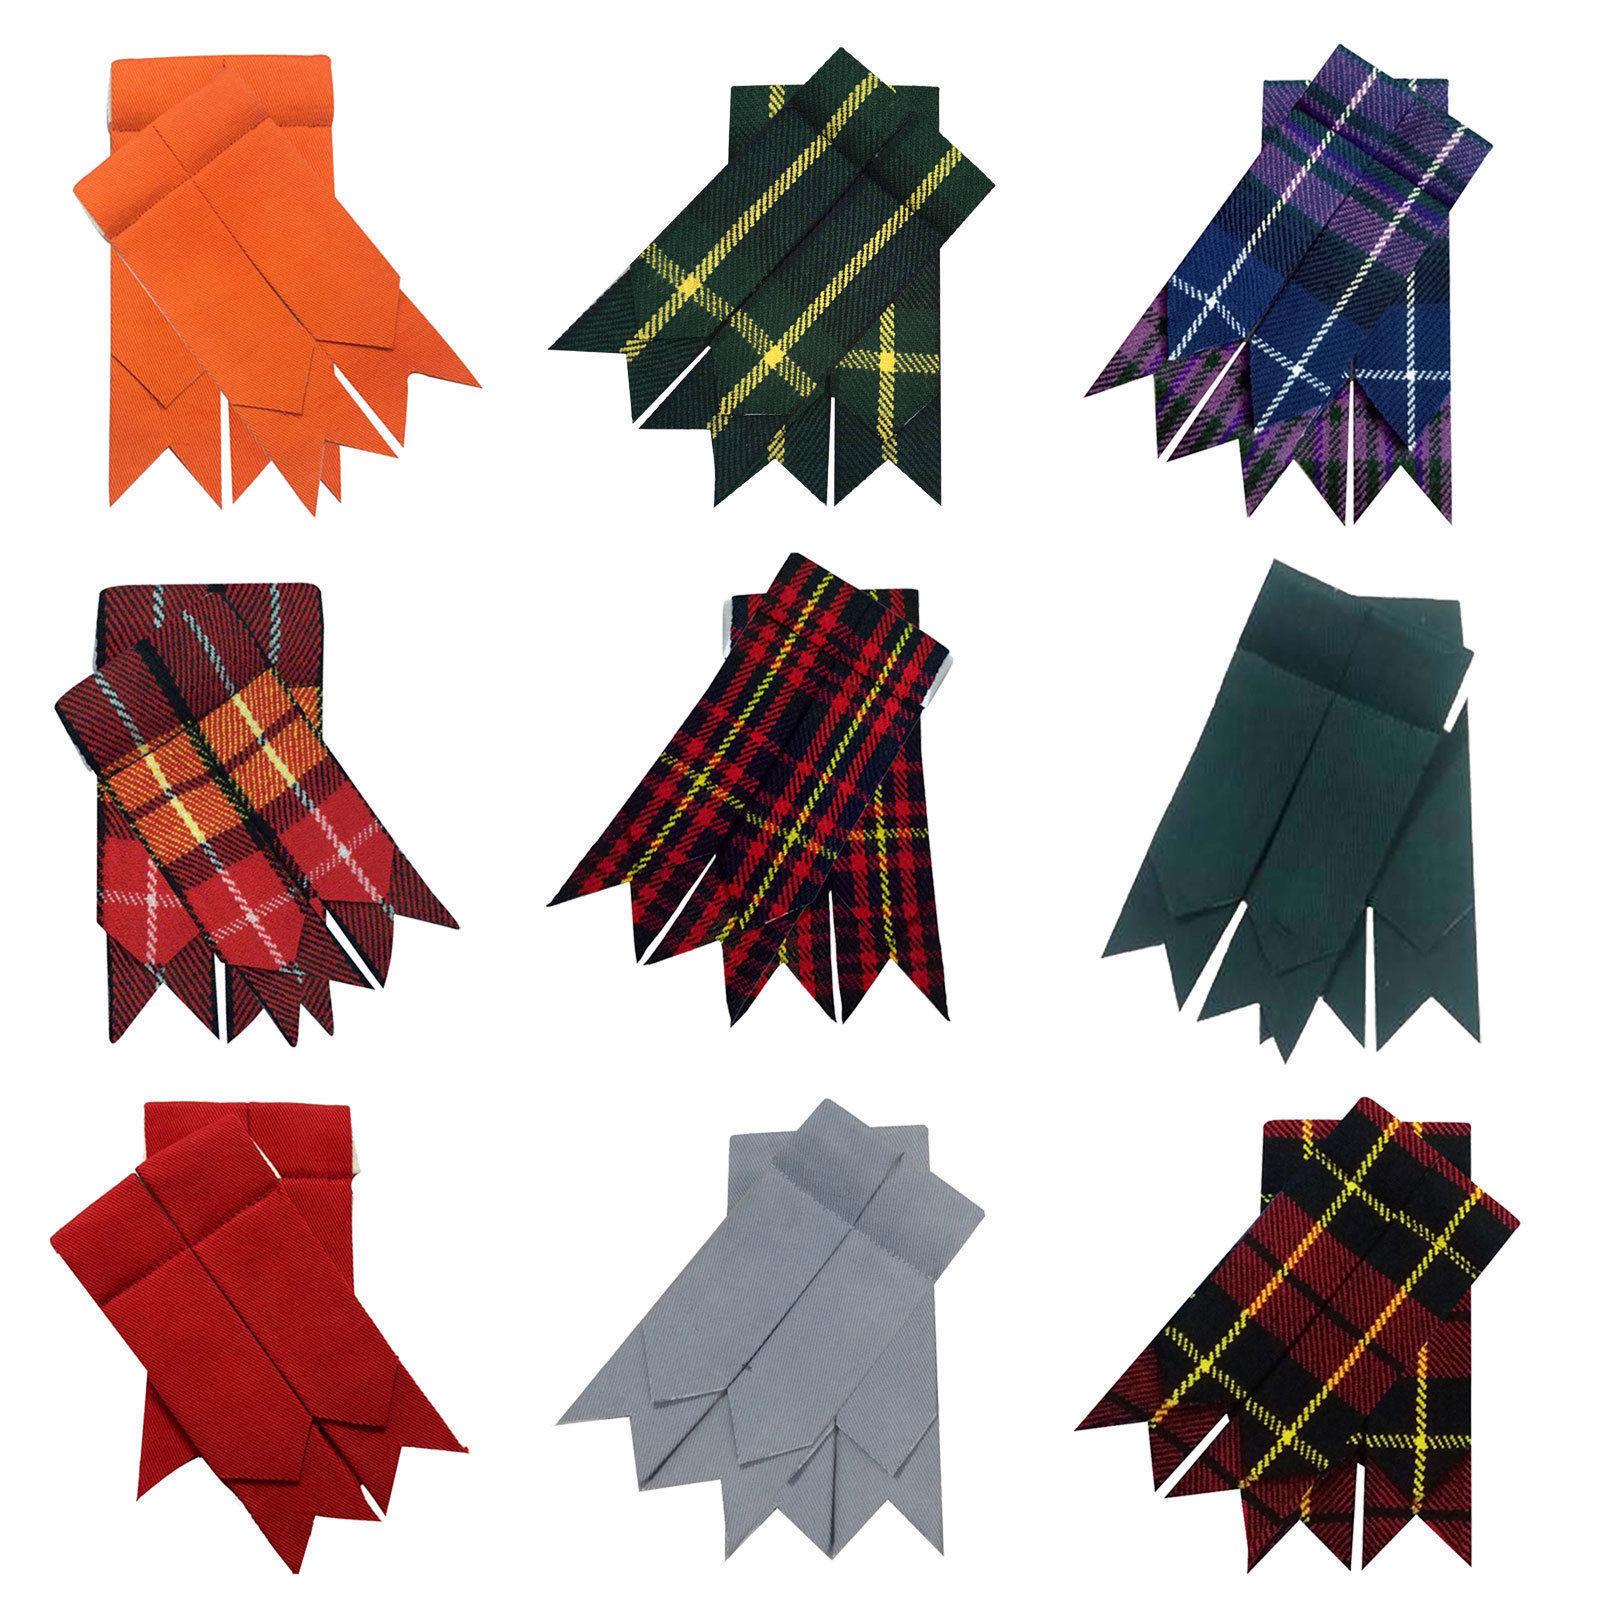 Men's Scottish Kilt Hose Sock Flashes Various Tartan 100% Acrylic Wool Garters